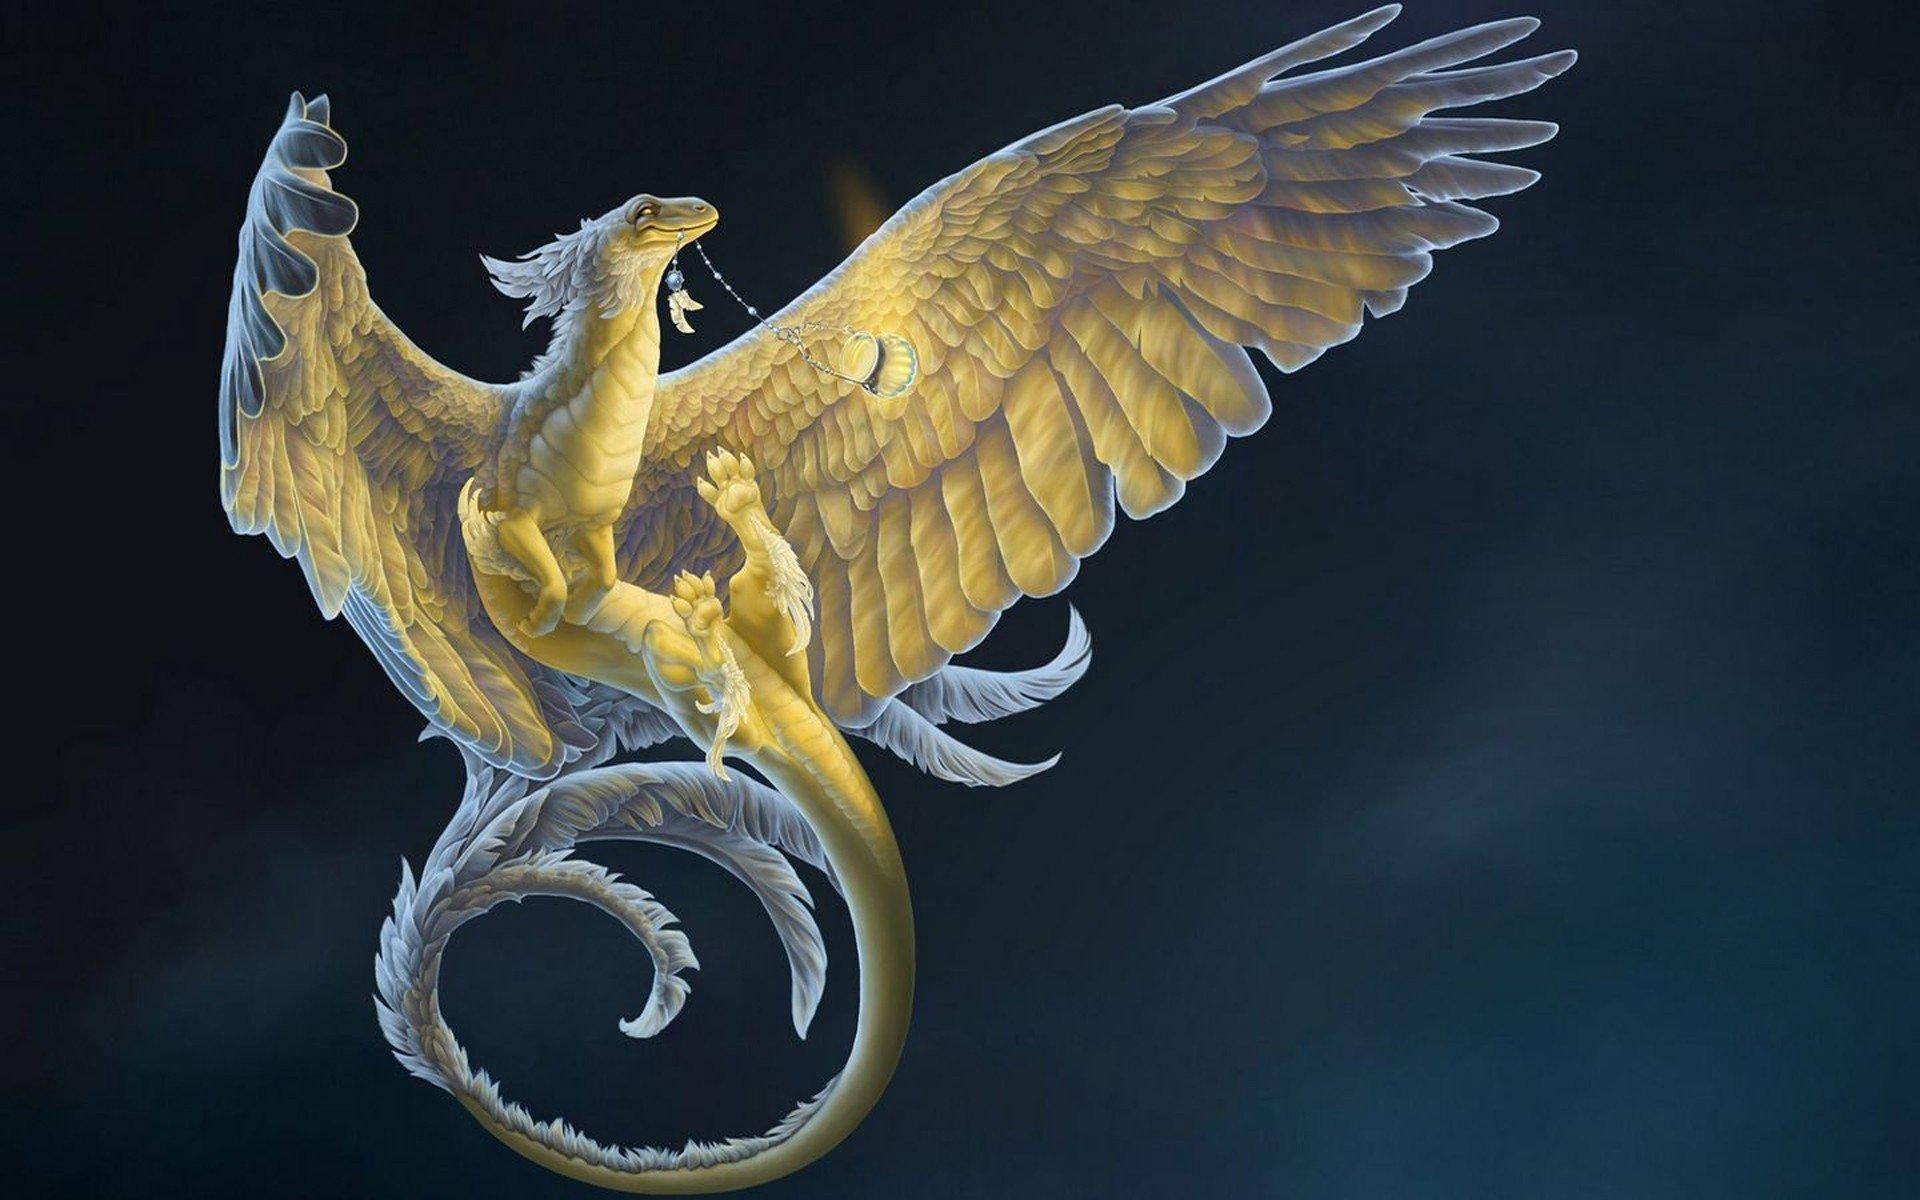 dragons fantasy wallpaper 1920x1200 - photo #29